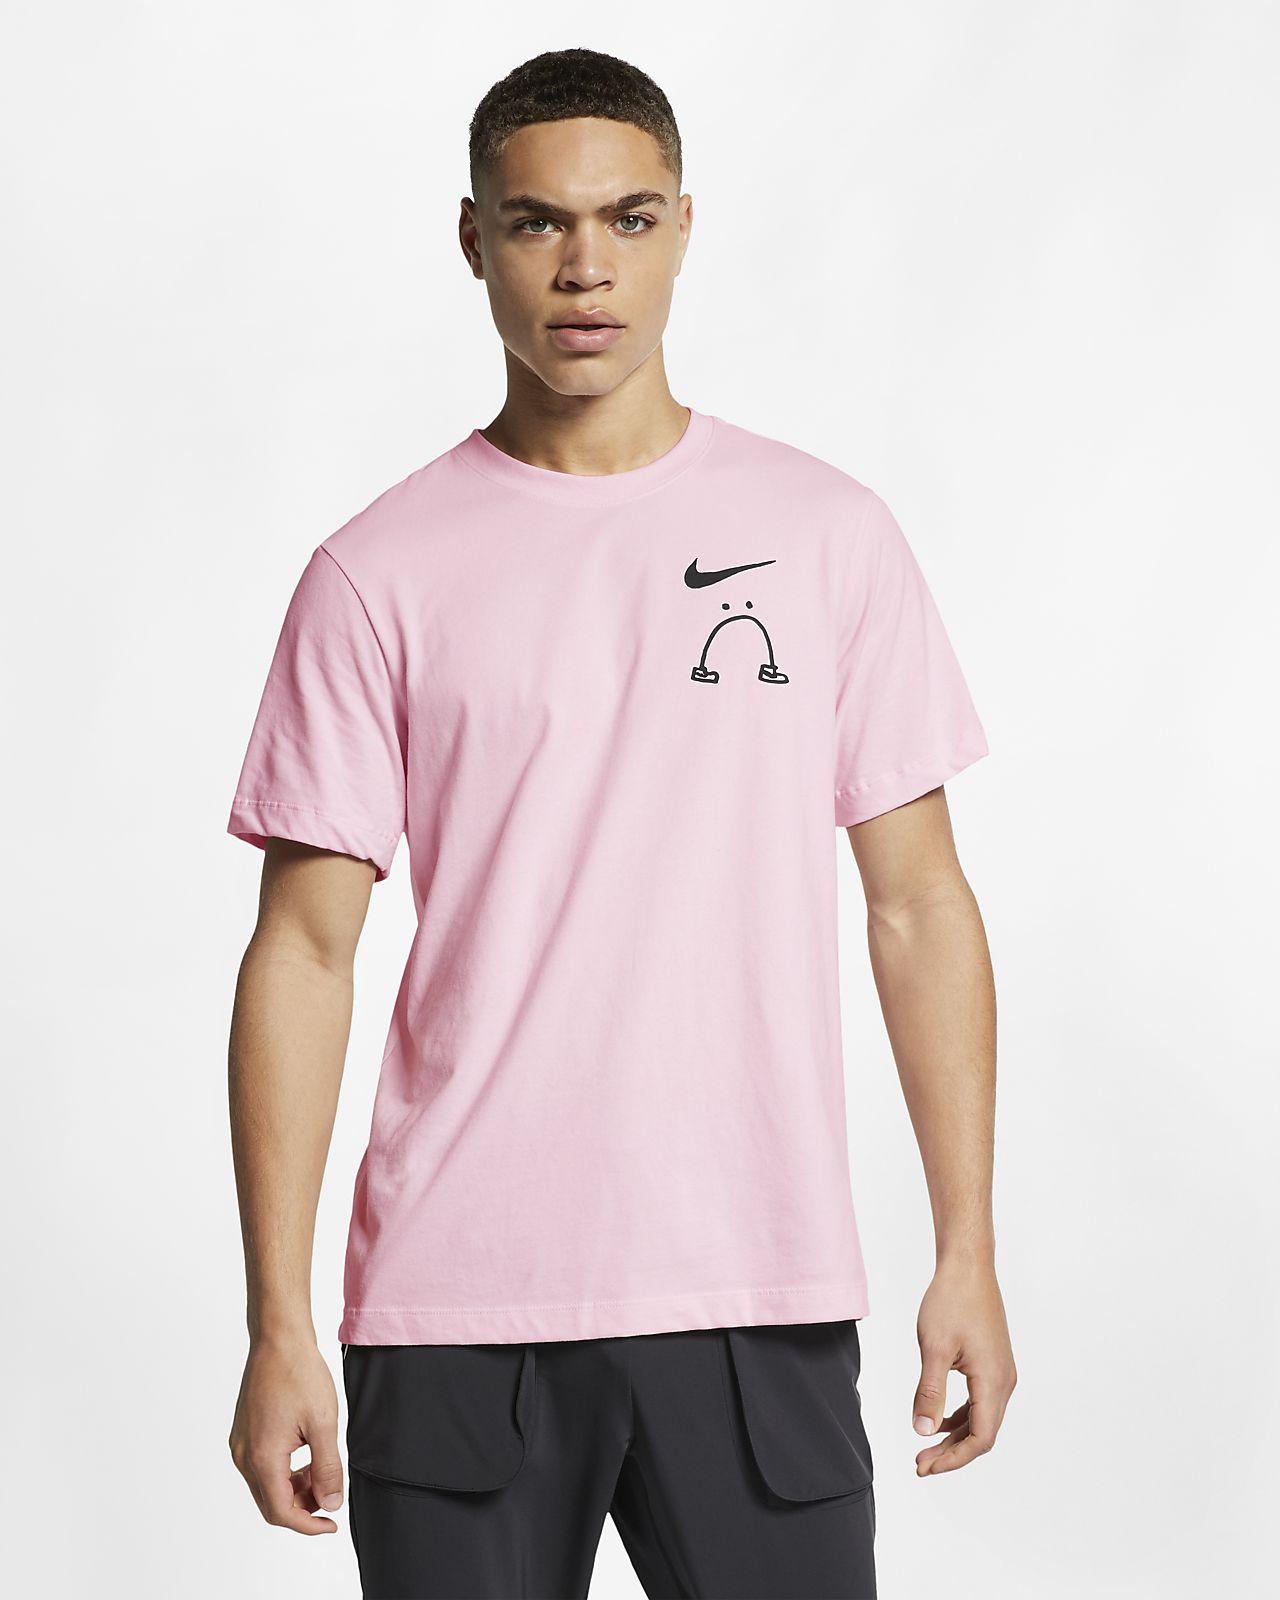 Nike Dri-FIT Nathan Bell Hardloopshirt voor heren